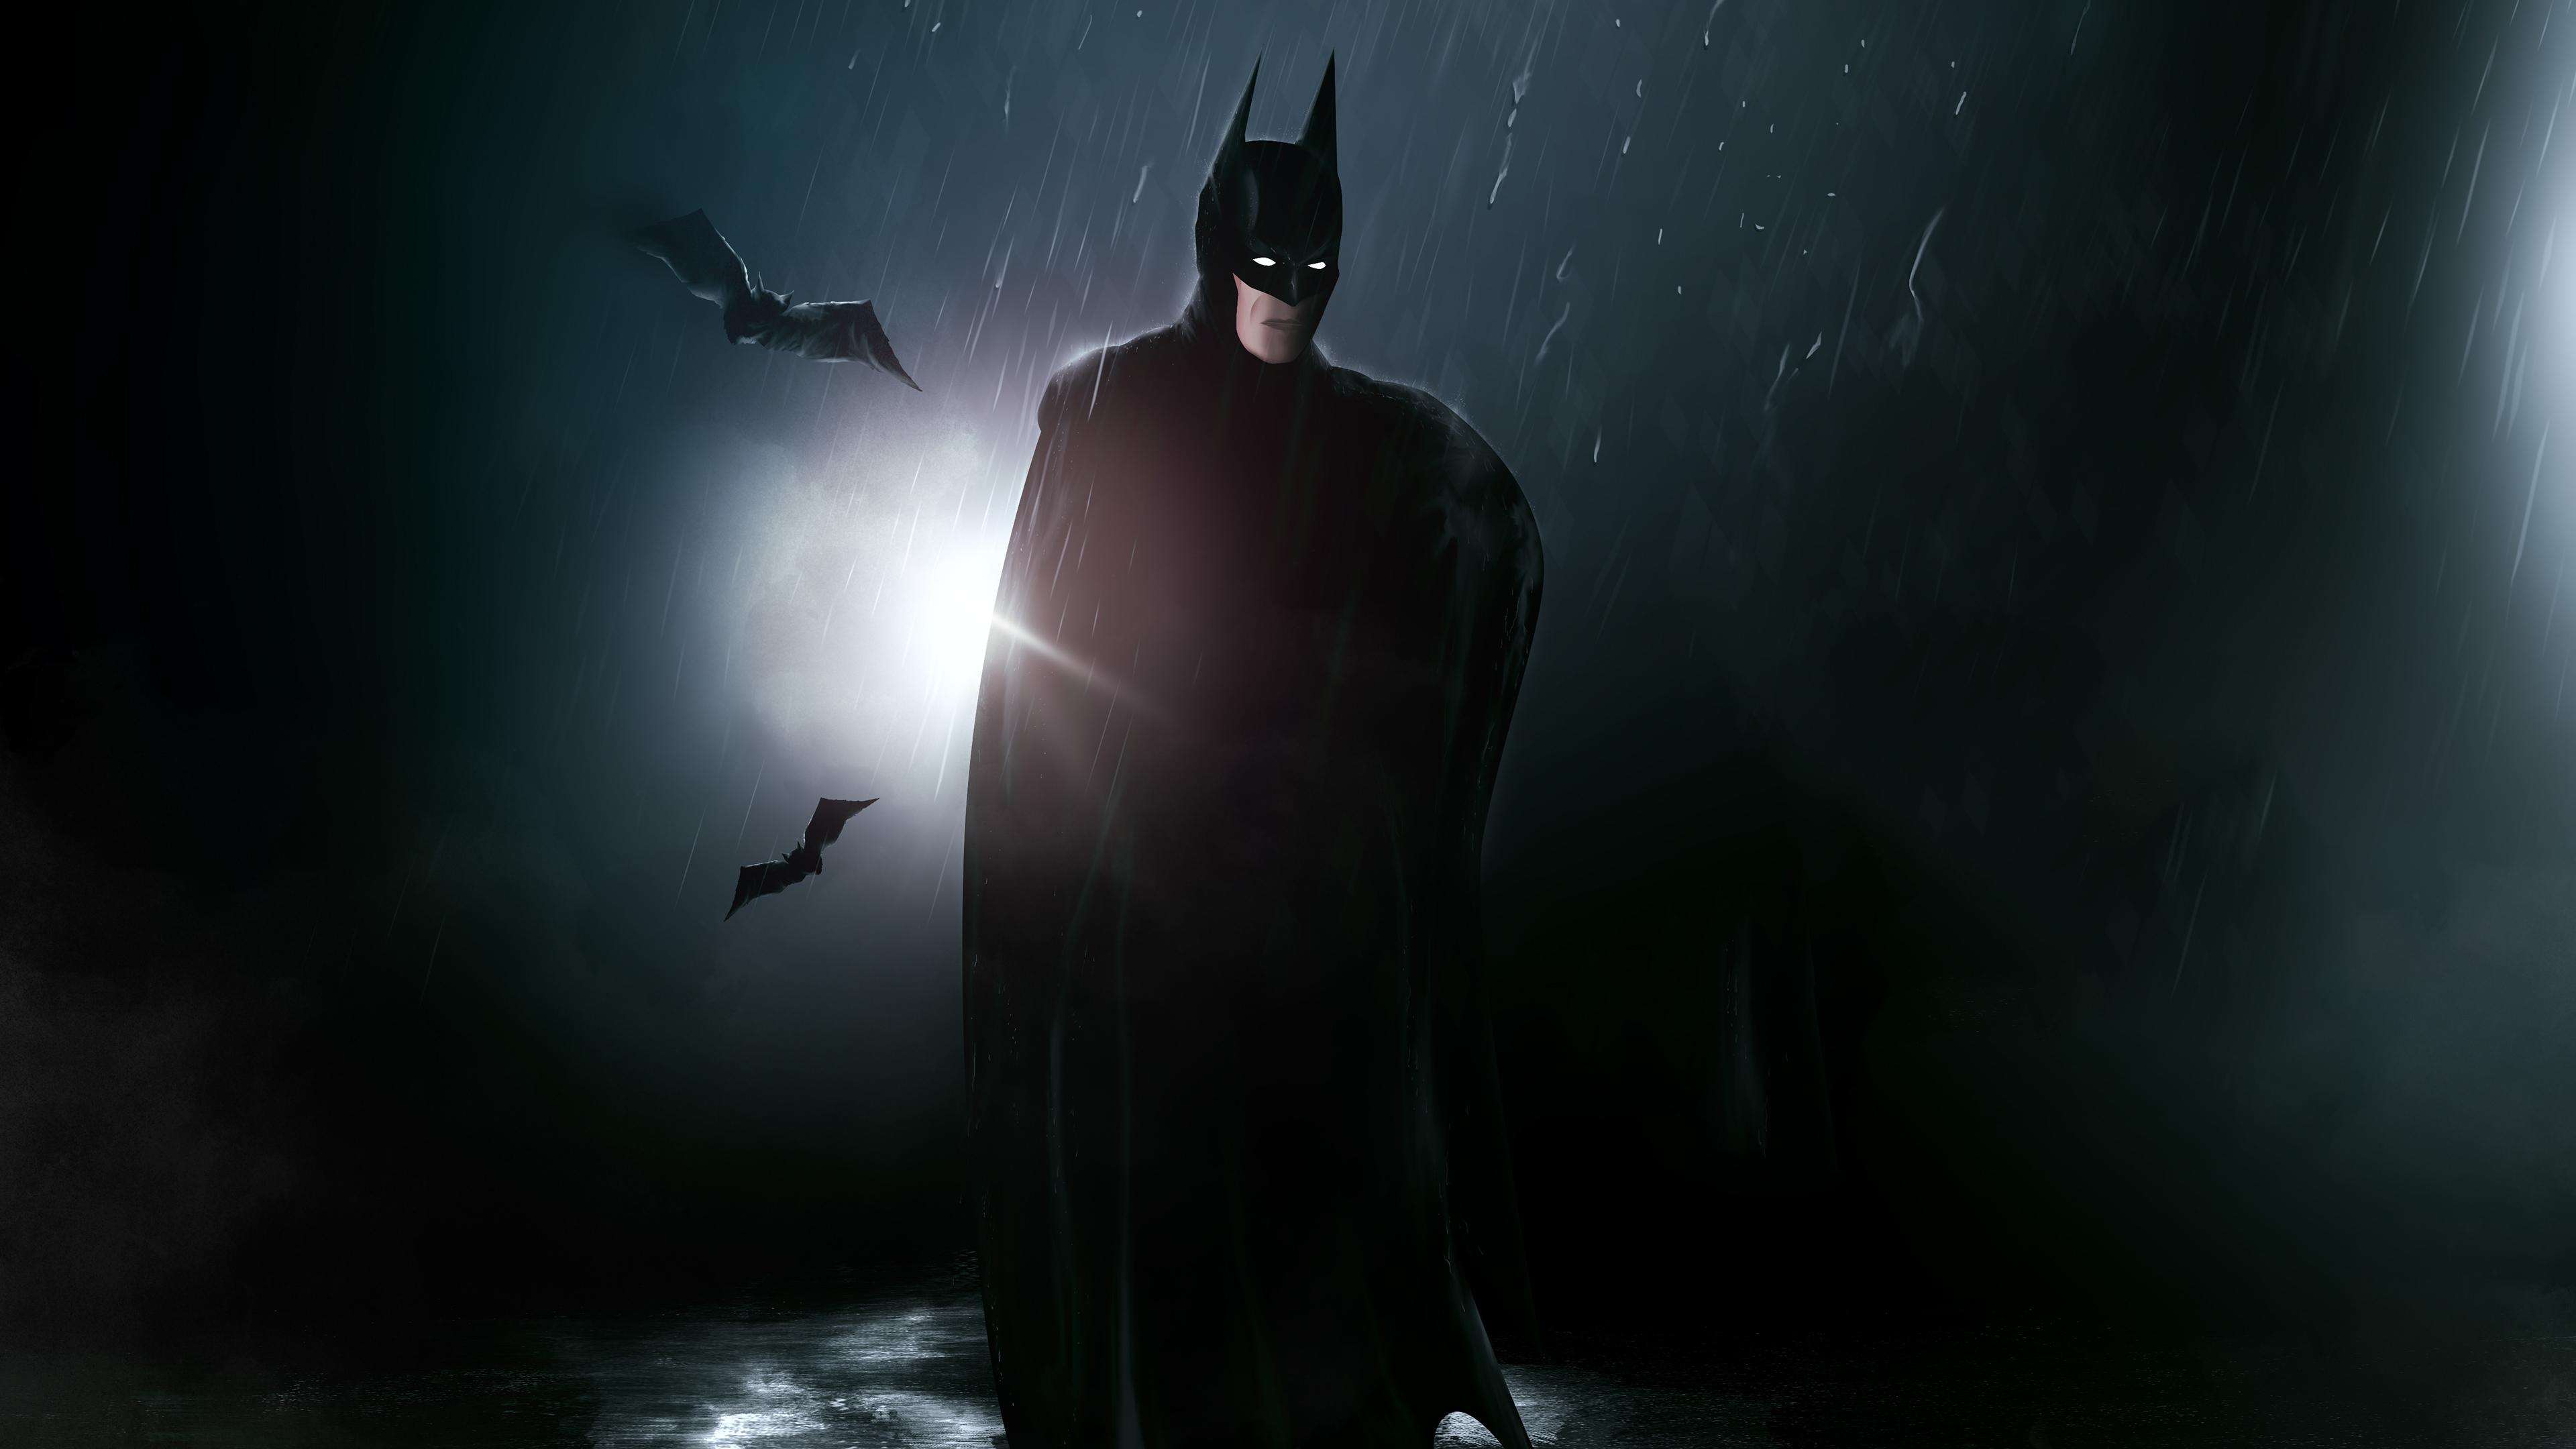 batman digital new 4k 1556184978 - Batman Digital New 4k - superheroes wallpapers, hd-wallpapers, digital art wallpapers, behance wallpapers, batman wallpapers, artwork wallpapers, 4k-wallpapers